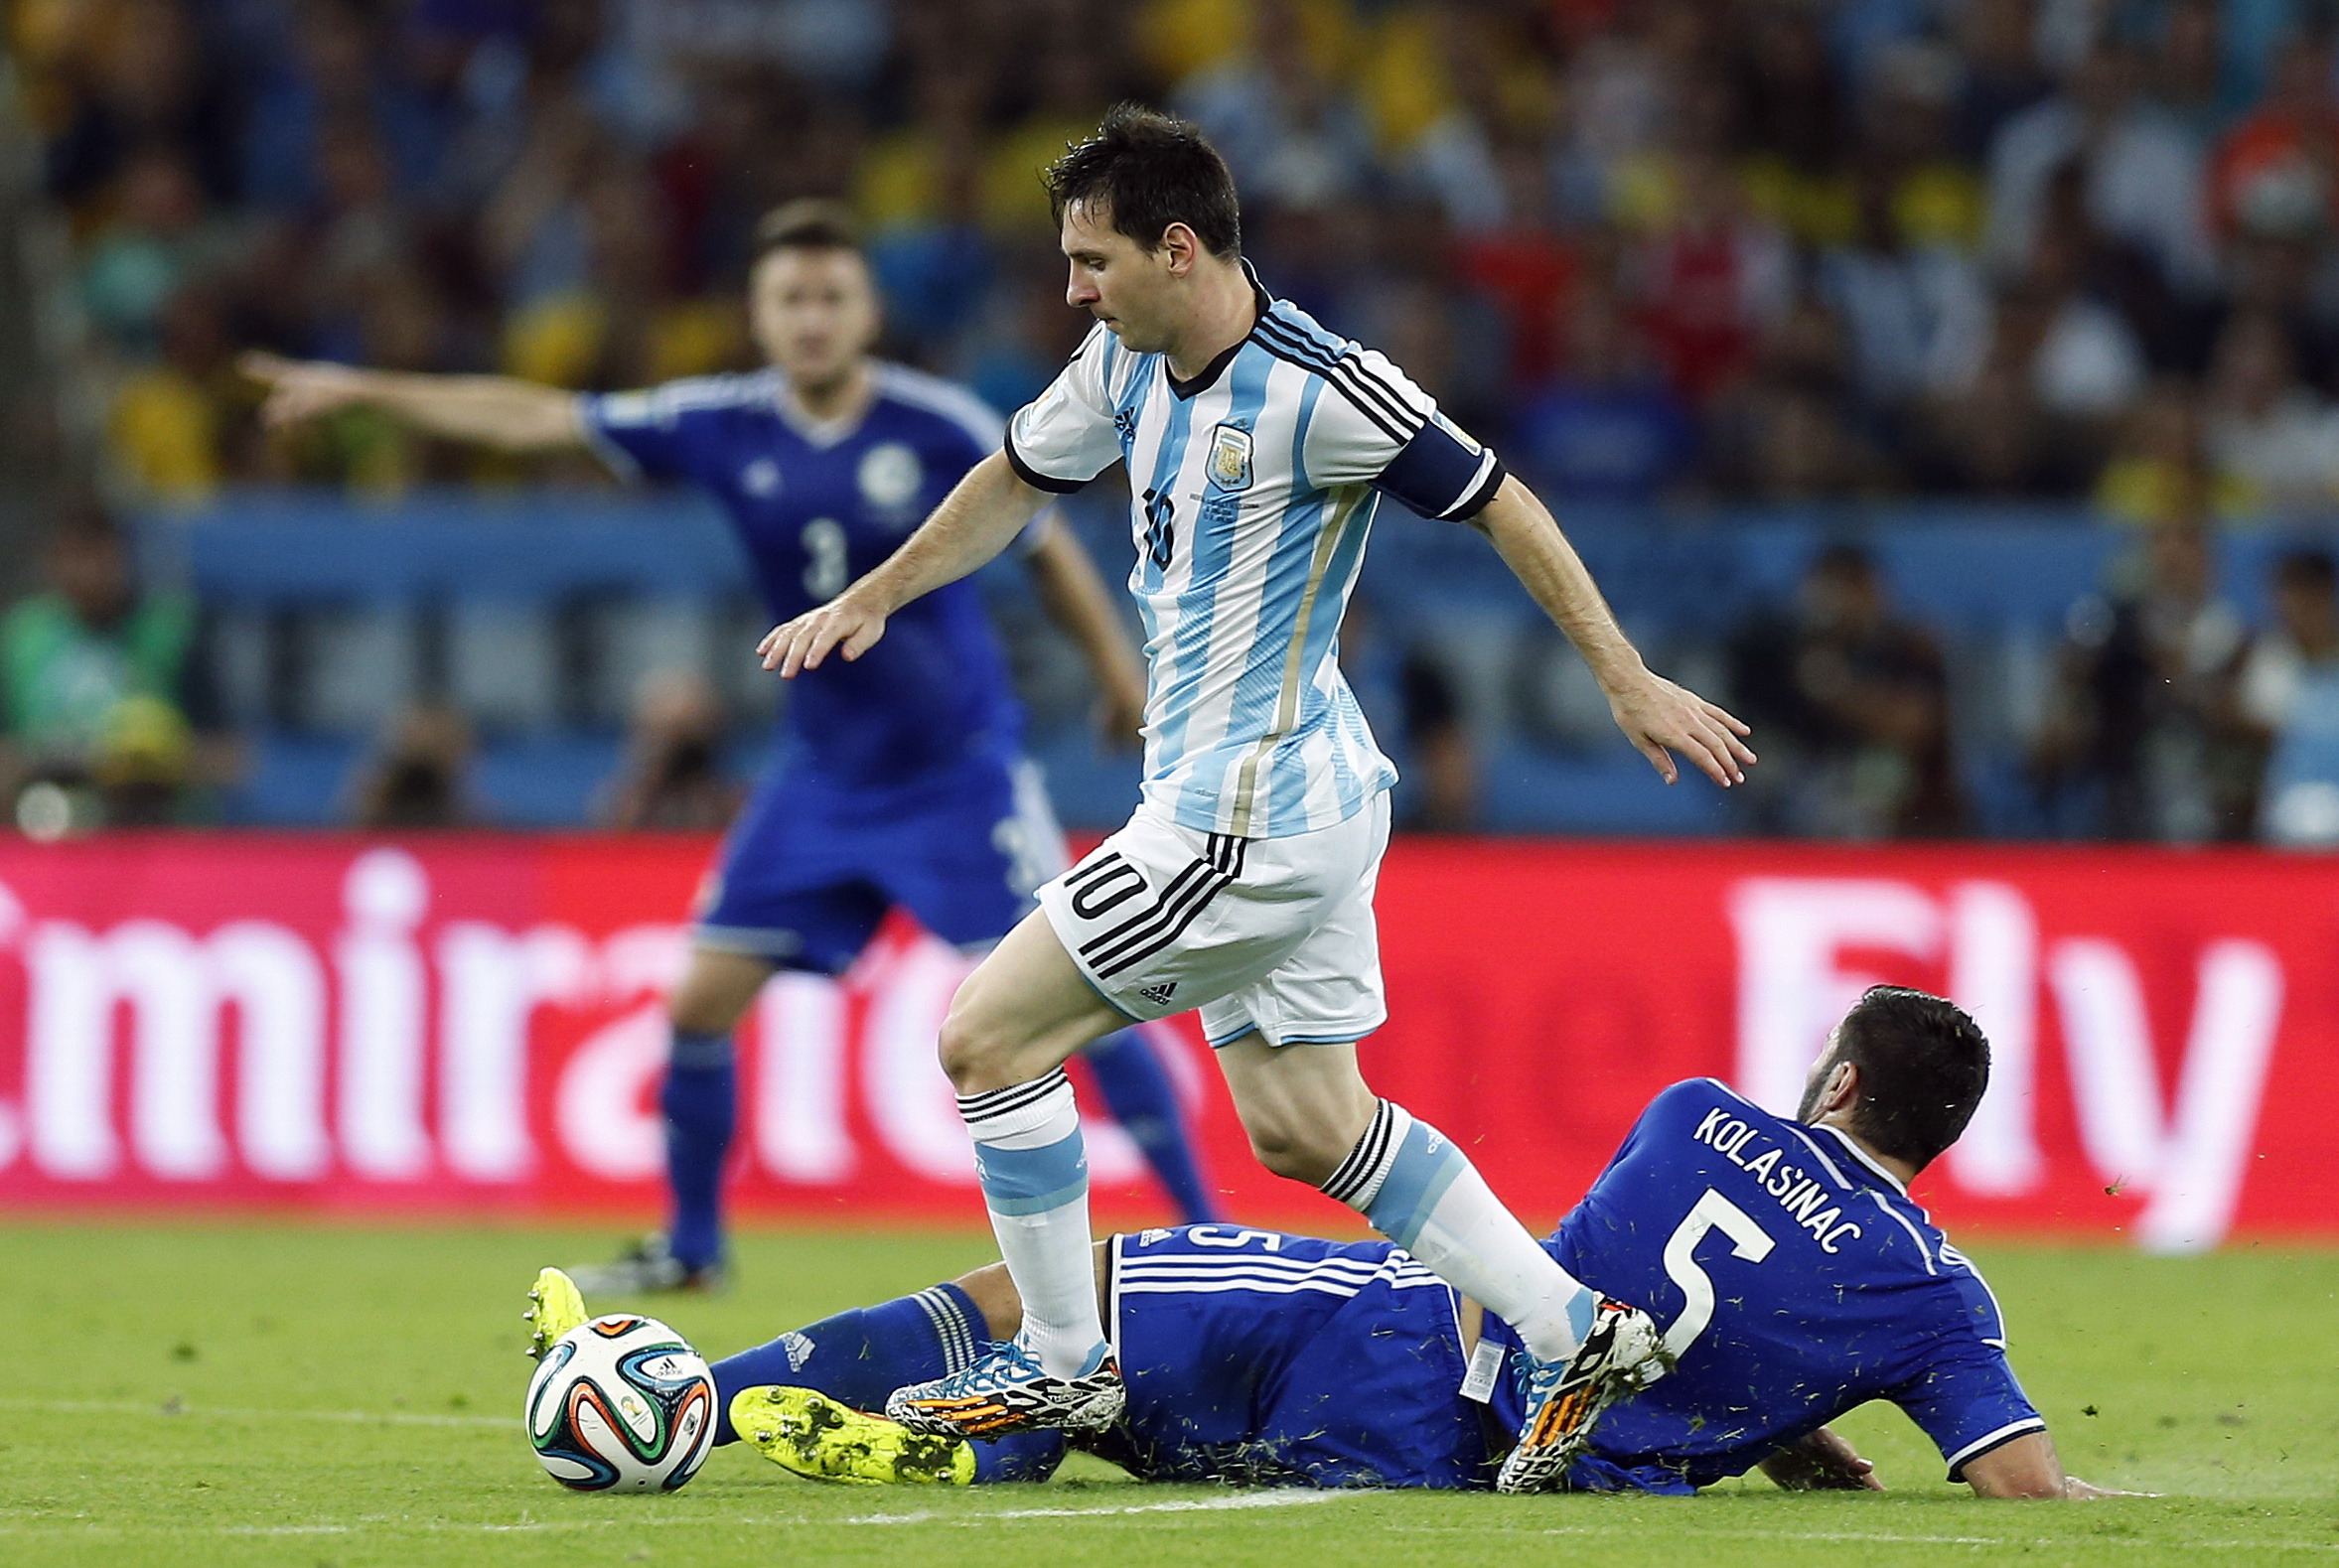 Jugadas de Messi - 2355x1579